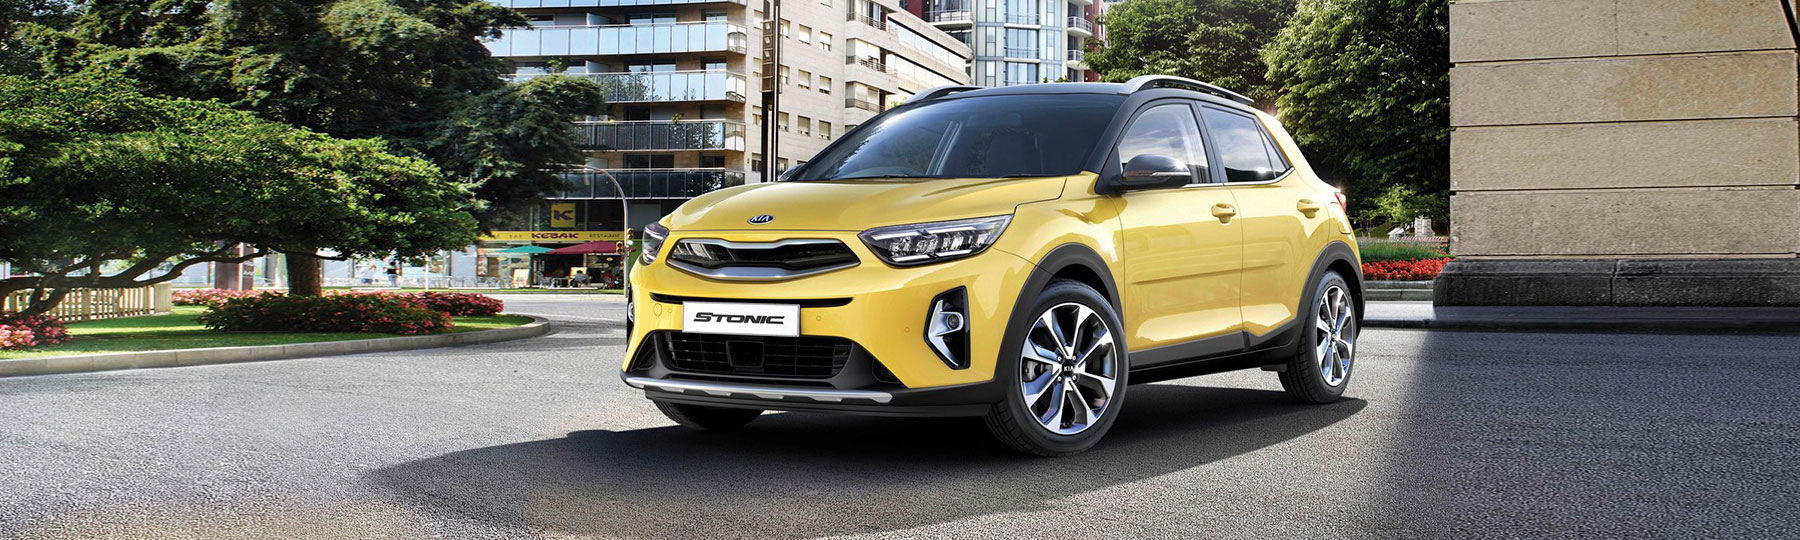 kia Stonic New Car Offer